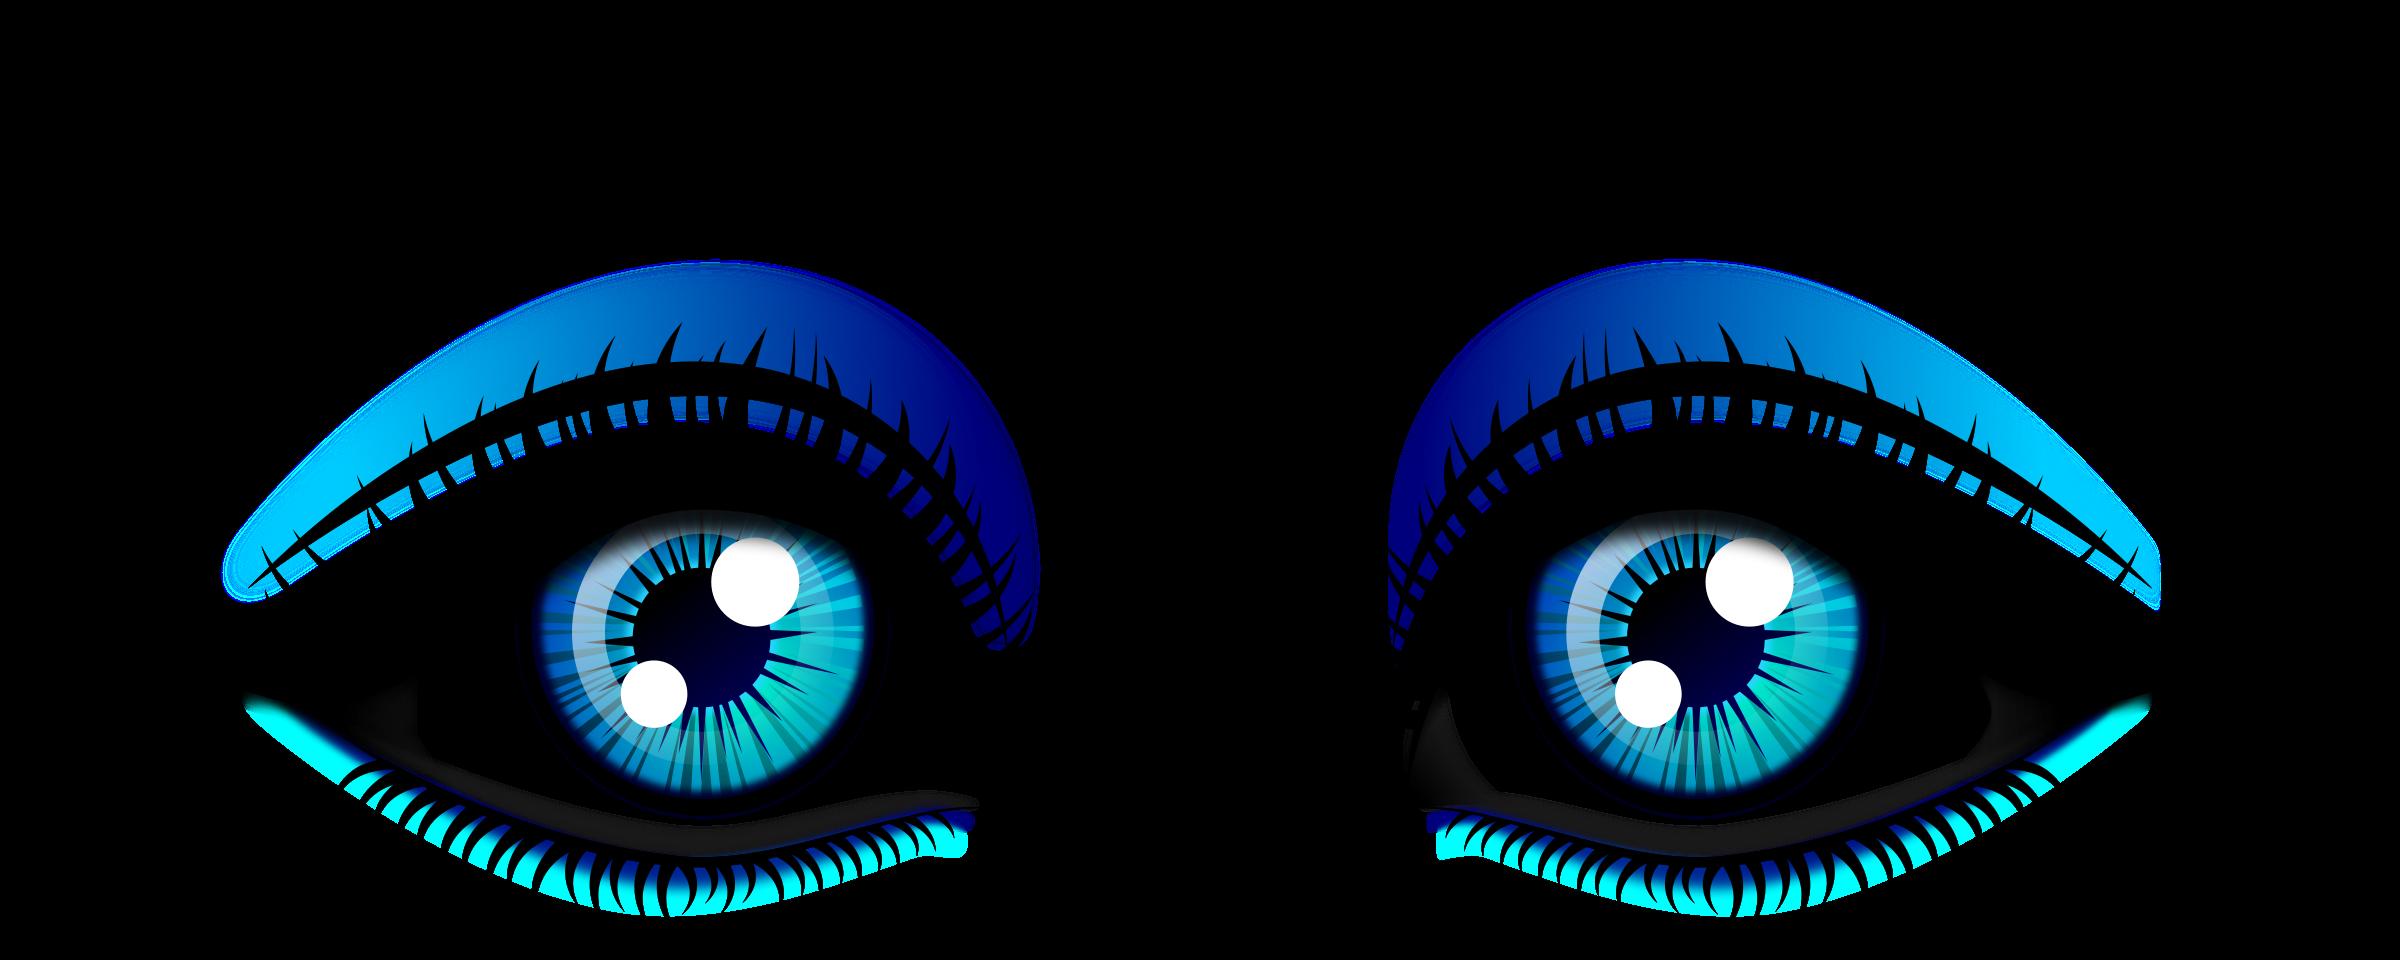 2400x960 Eye Images Clip Art